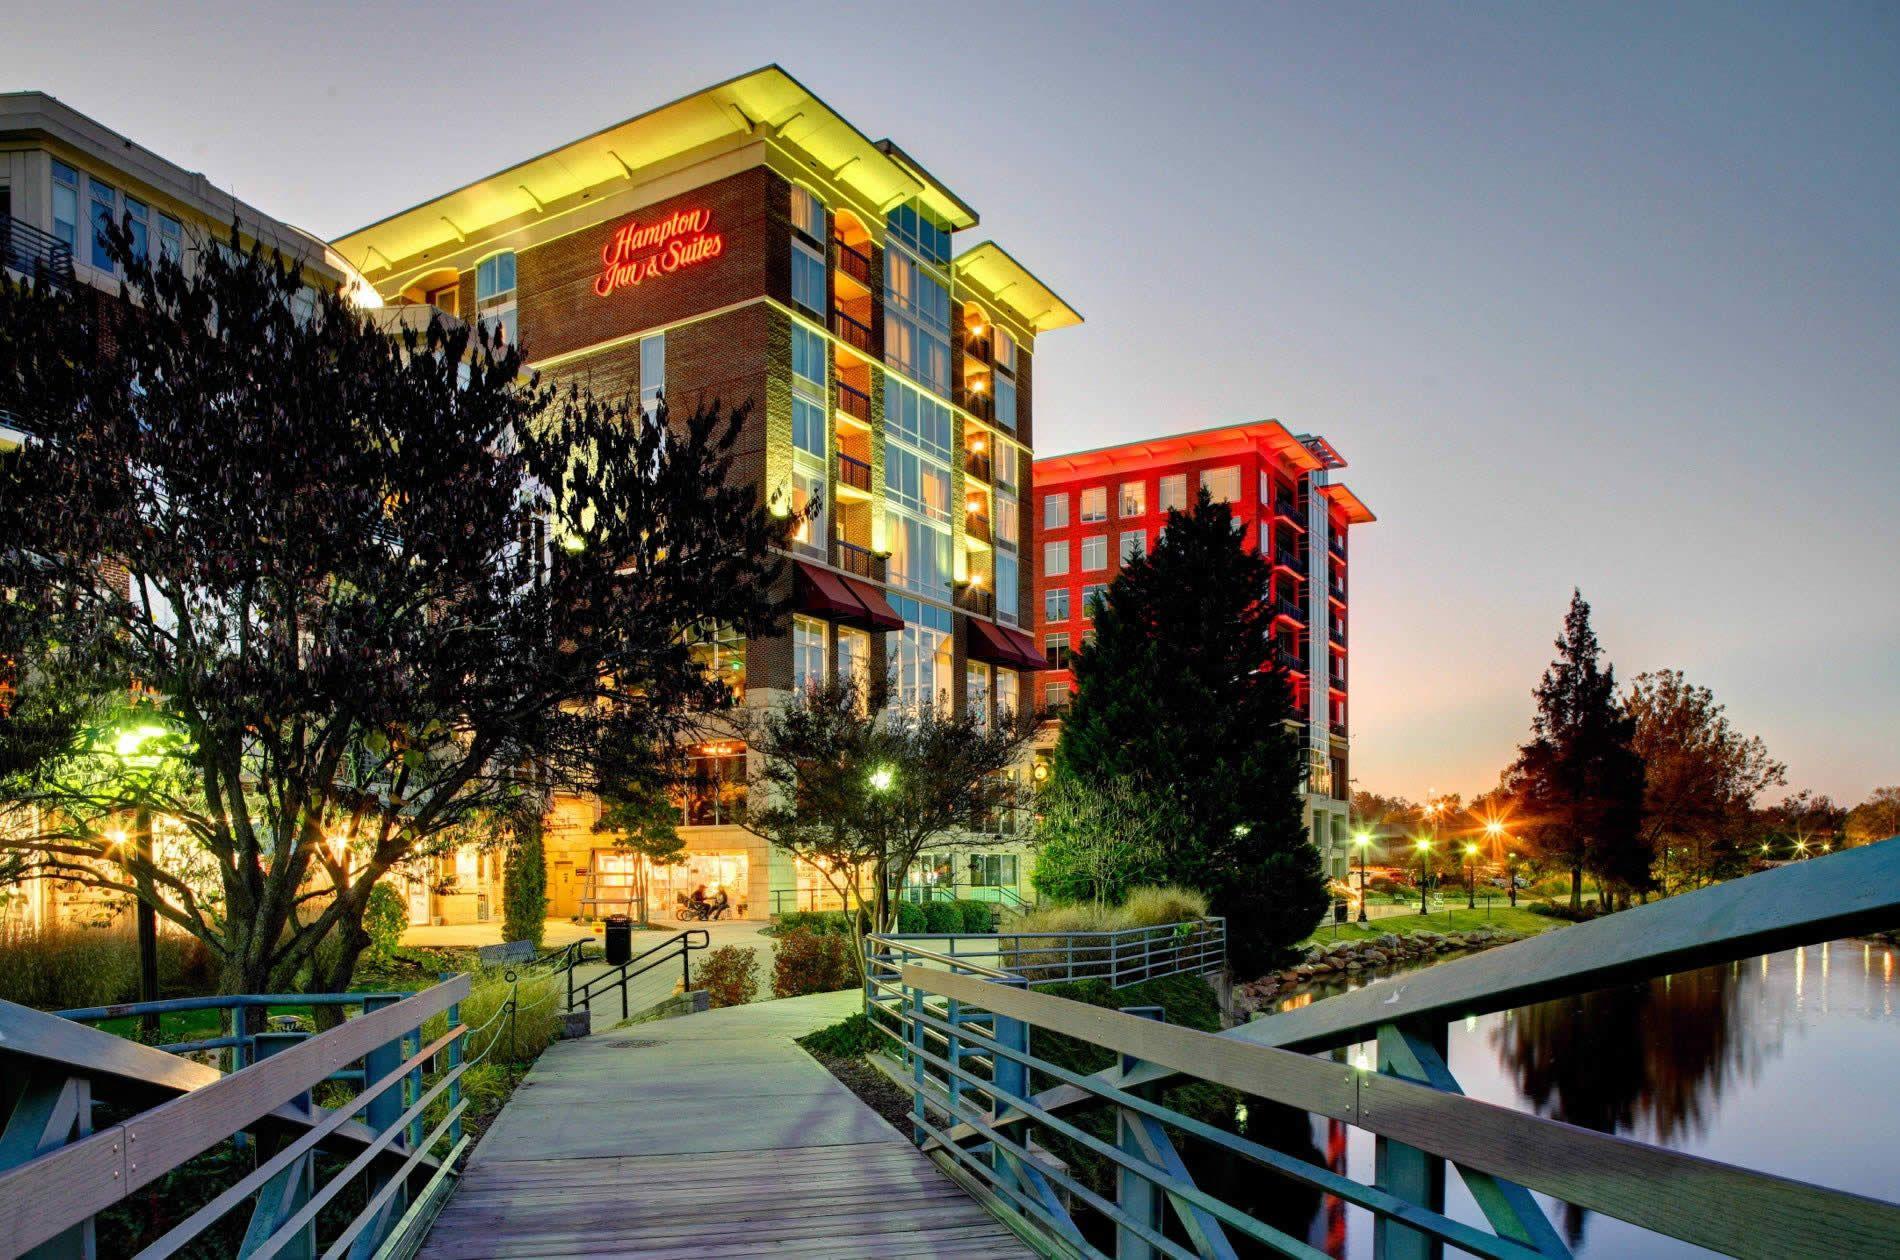 Hampton Inn Suites By Hilton Greenville Downtown Riverplace Mobile Hampton Inn Downtown Suites